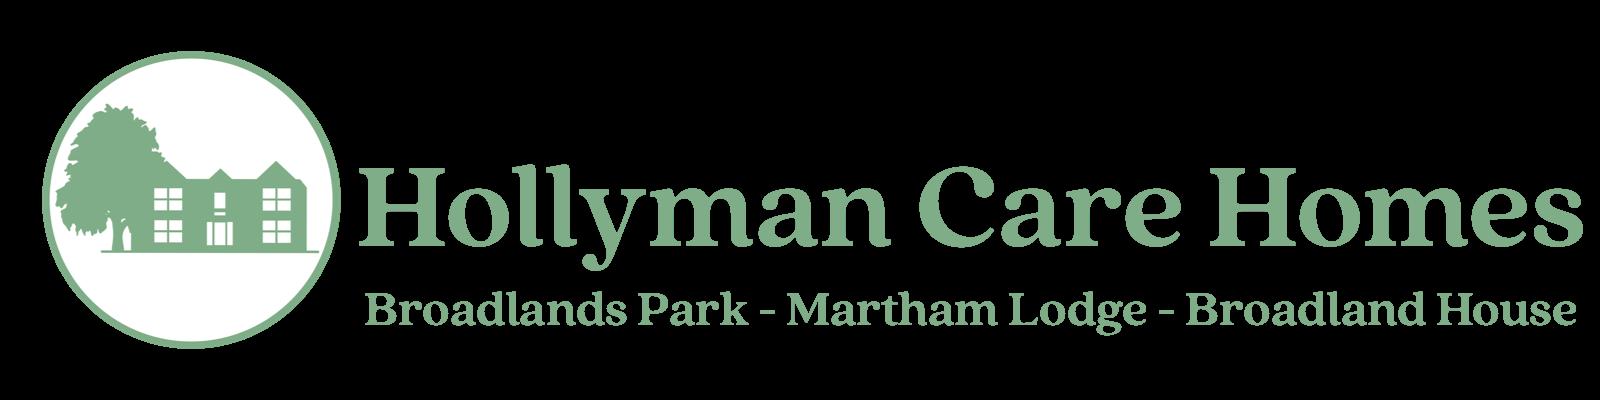 Hollyman Care Homes